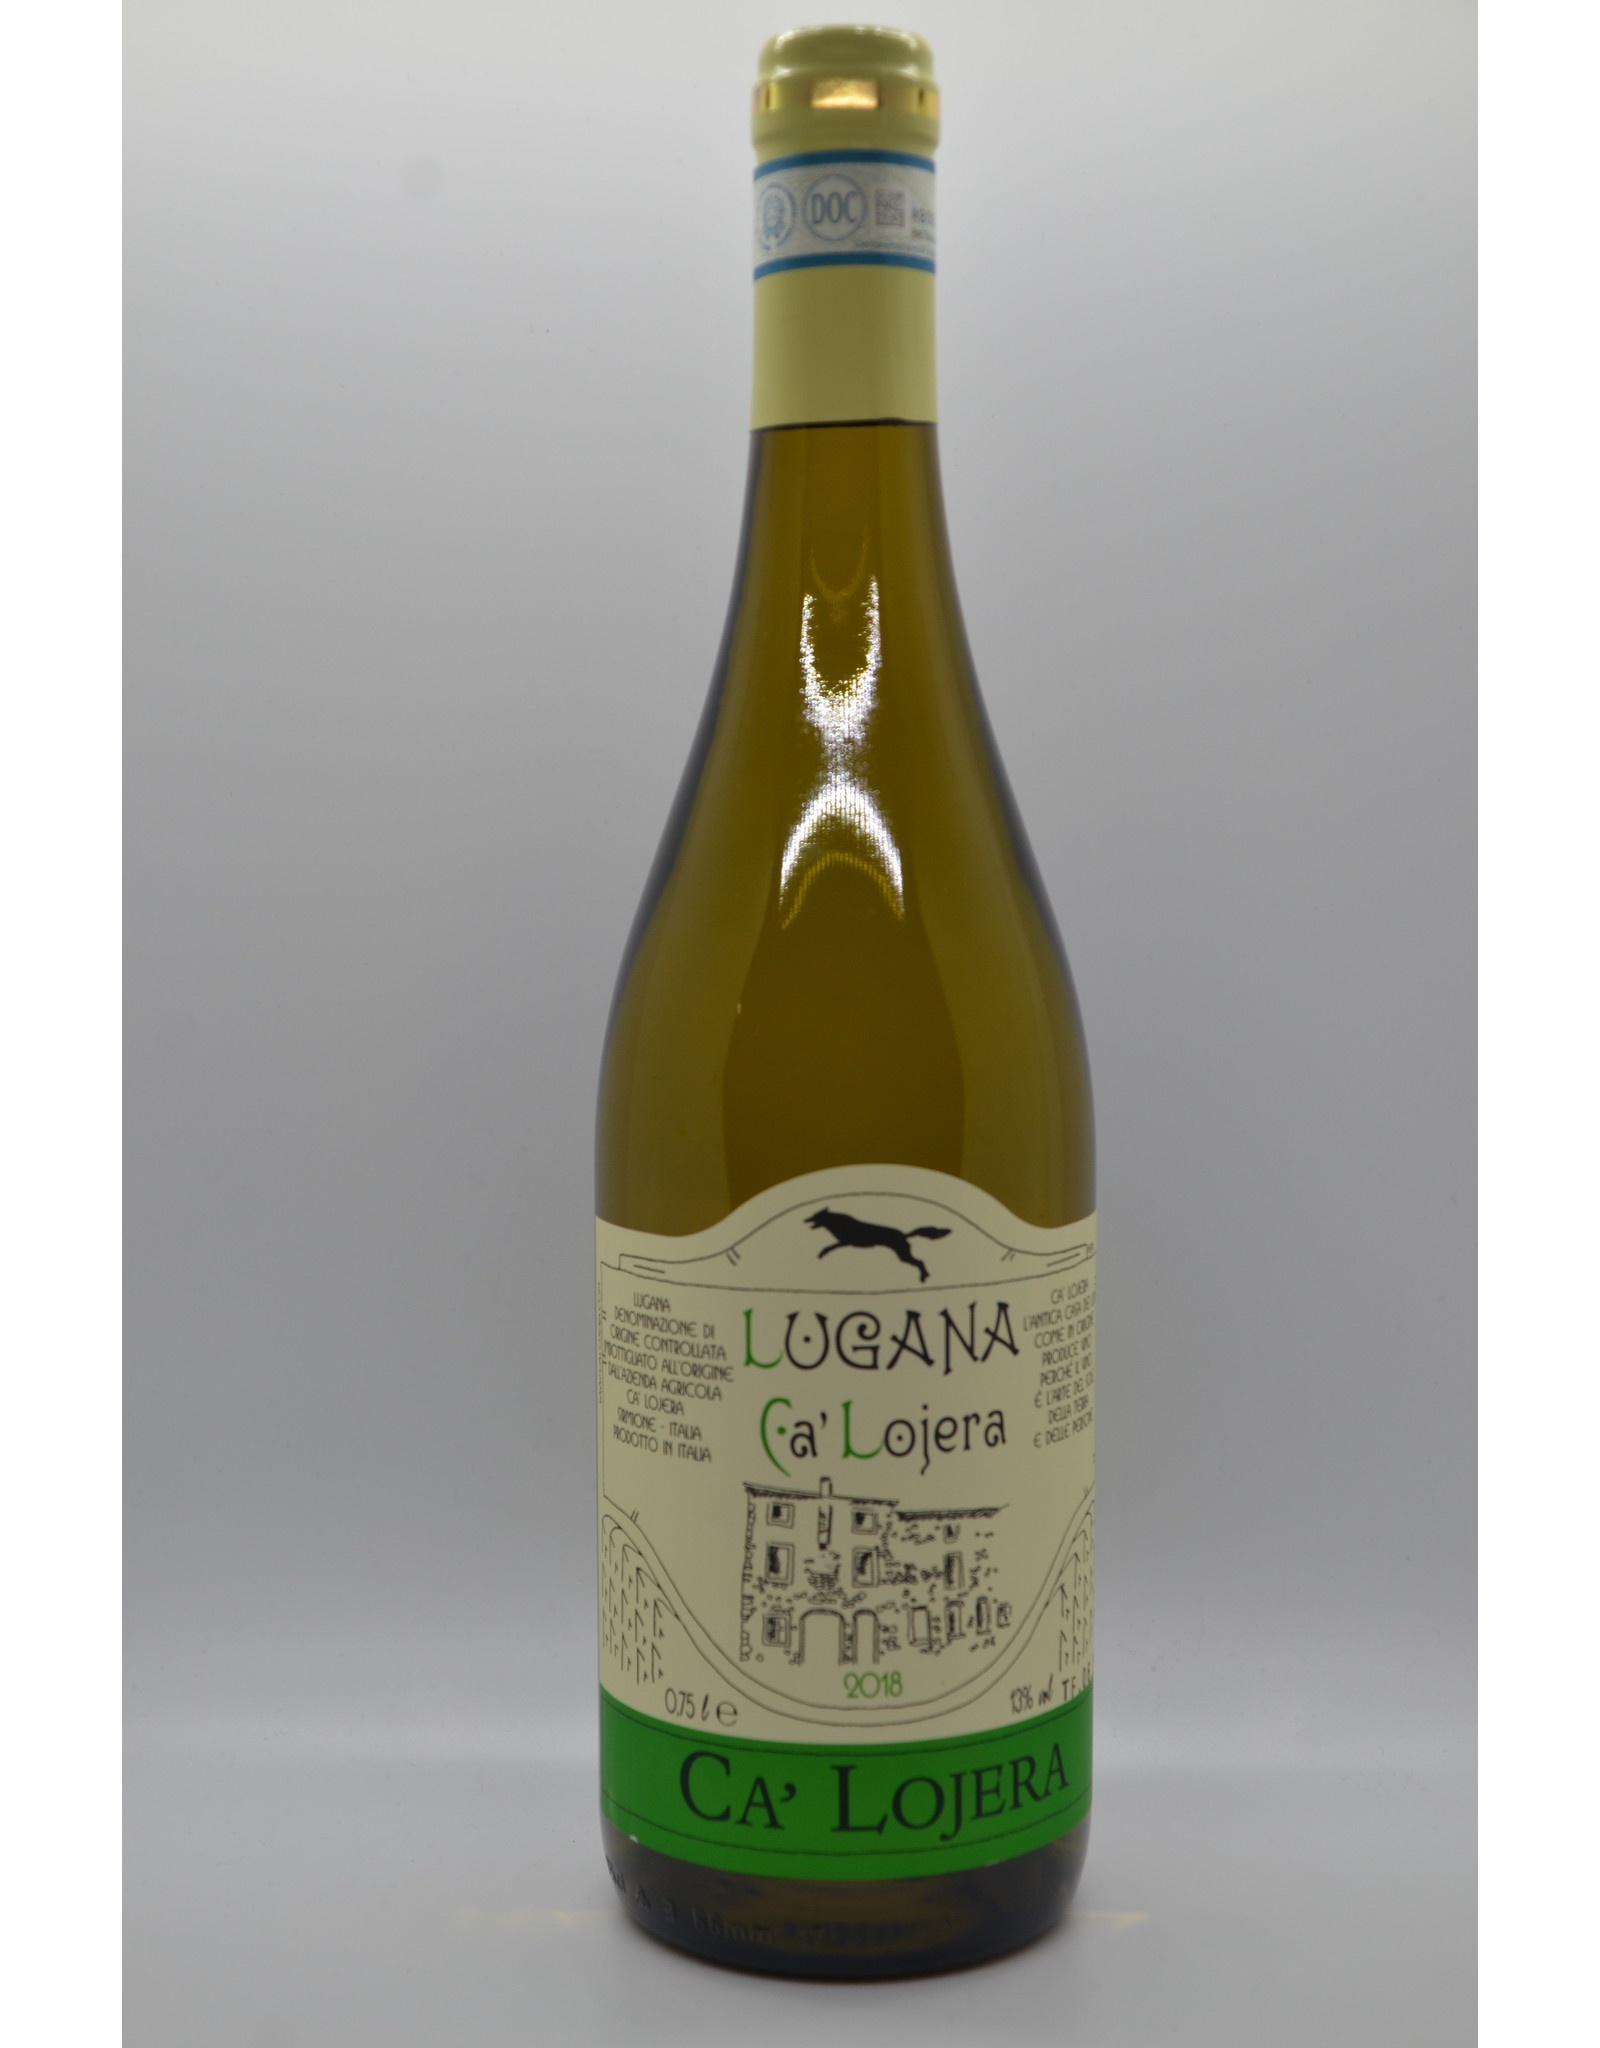 Italy Ca'Lojera Lugana